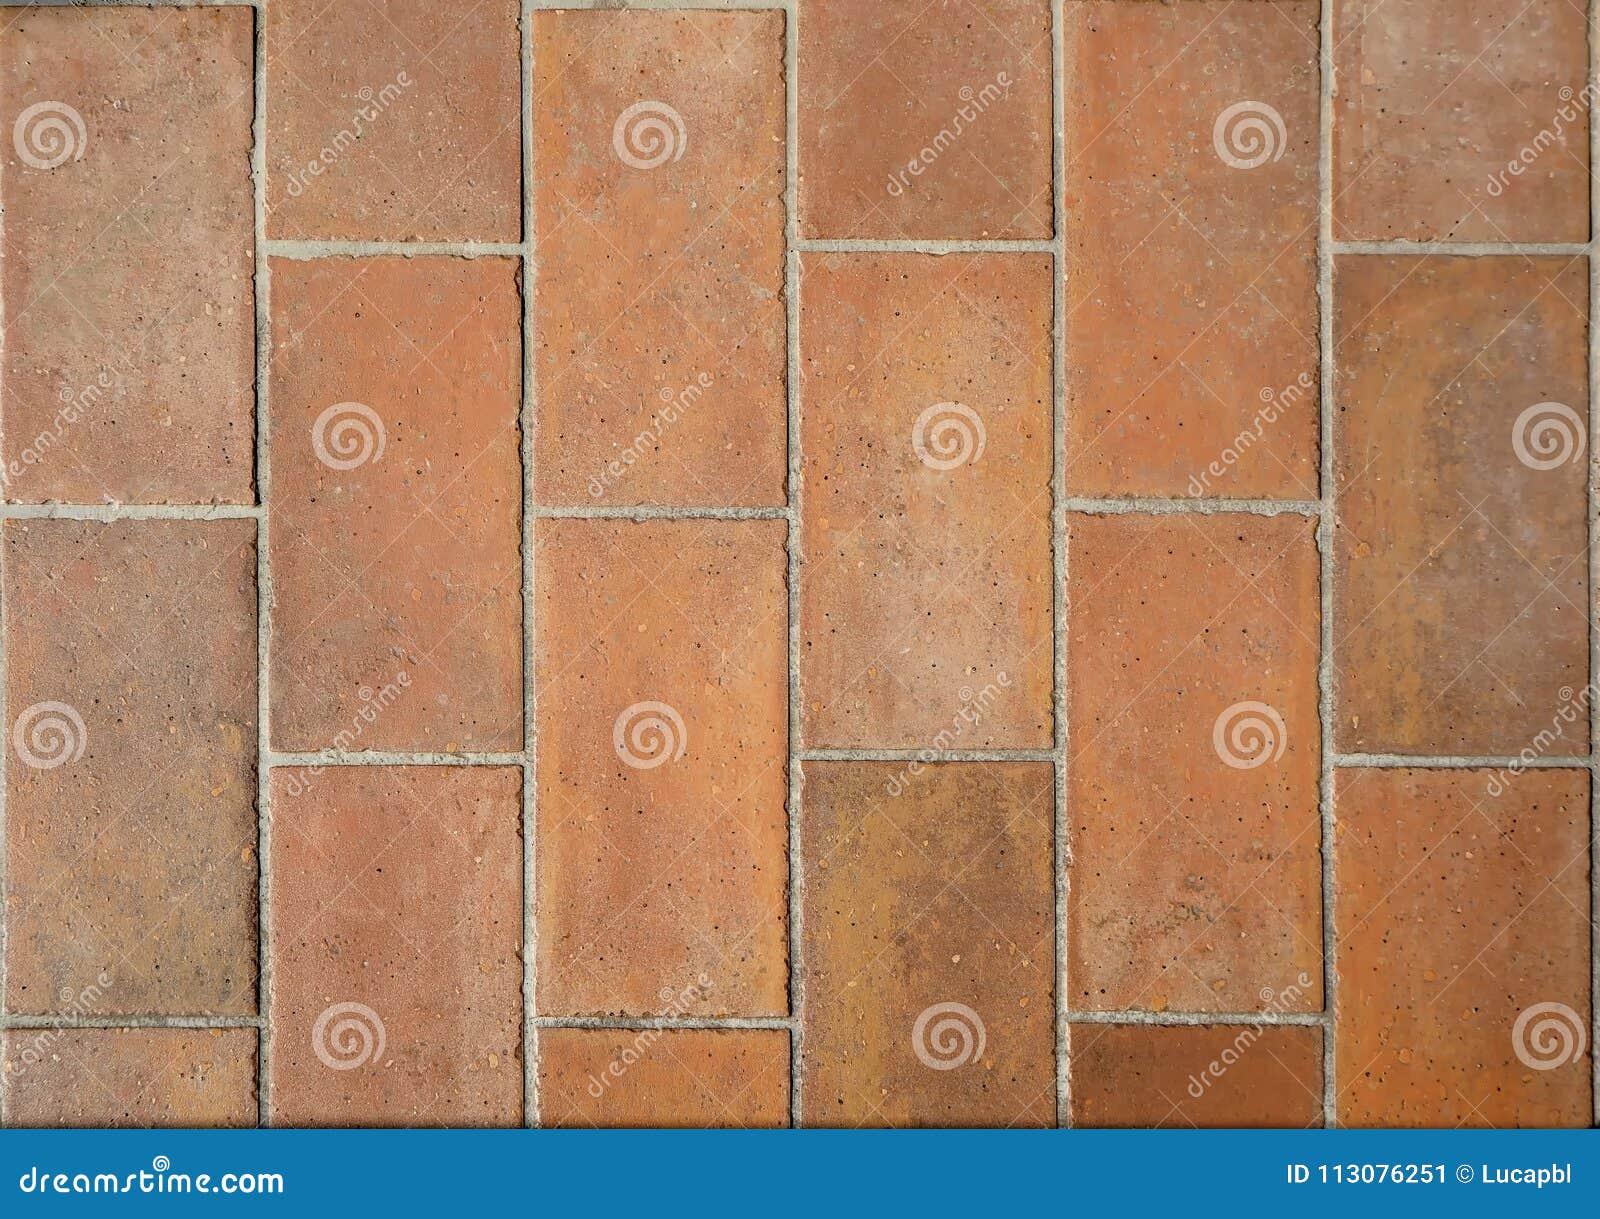 Rustic Terracotta Tiles For Balconies Or Outdoor Floors Stock Image